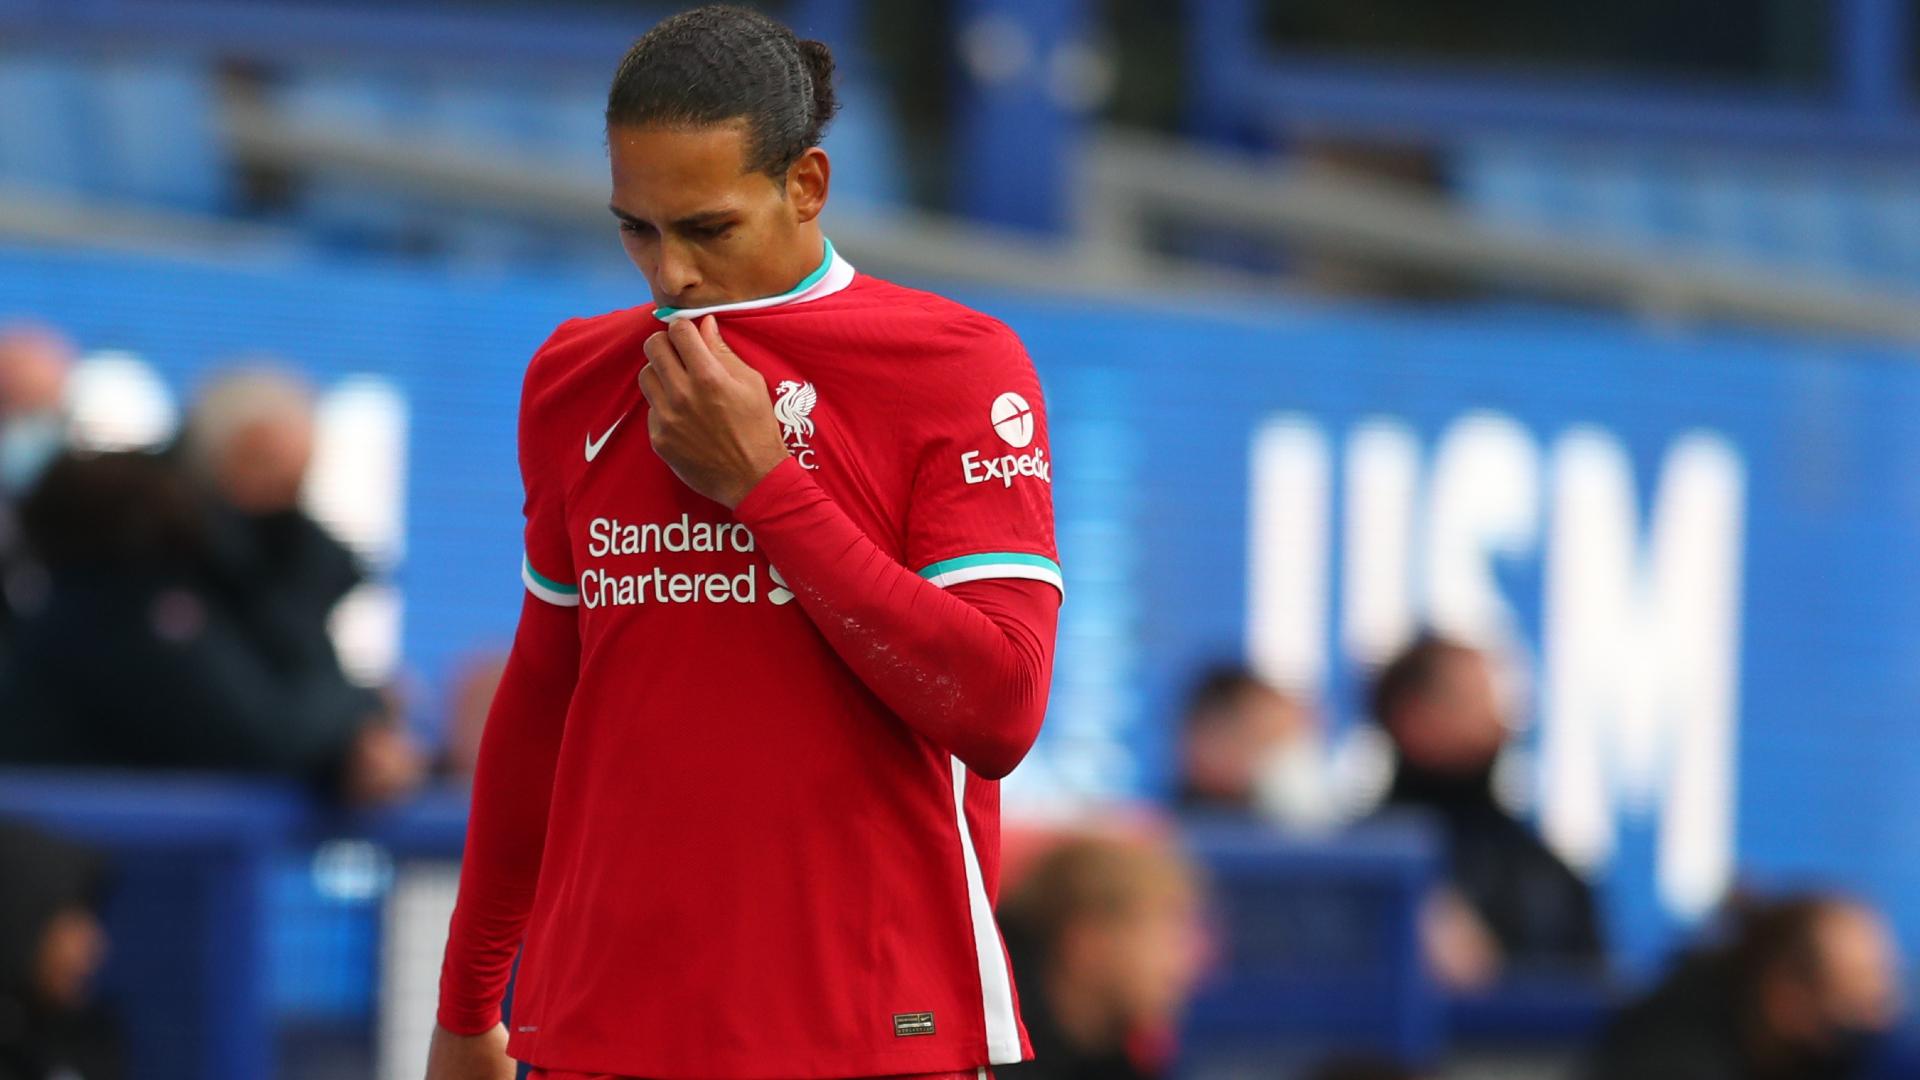 Klopp says Van Dijk injury 'not good' as Liverpool dealt derby blows by  Pickford and VAR